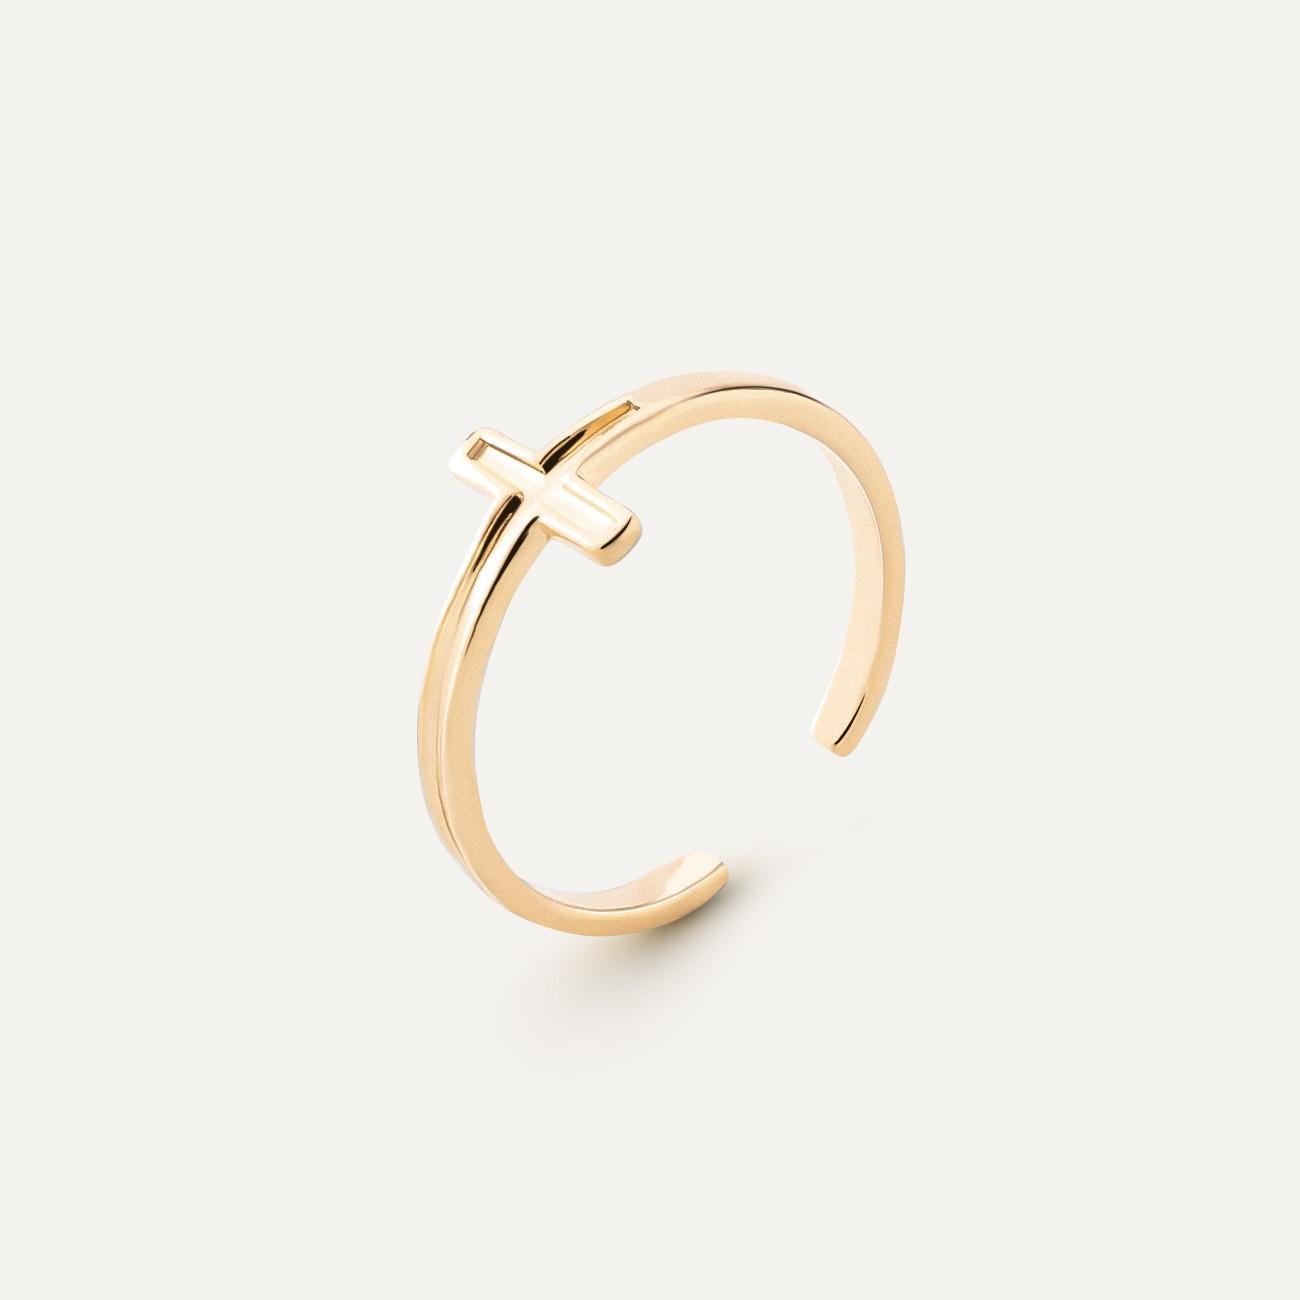 Cross ring, sterling silver 925